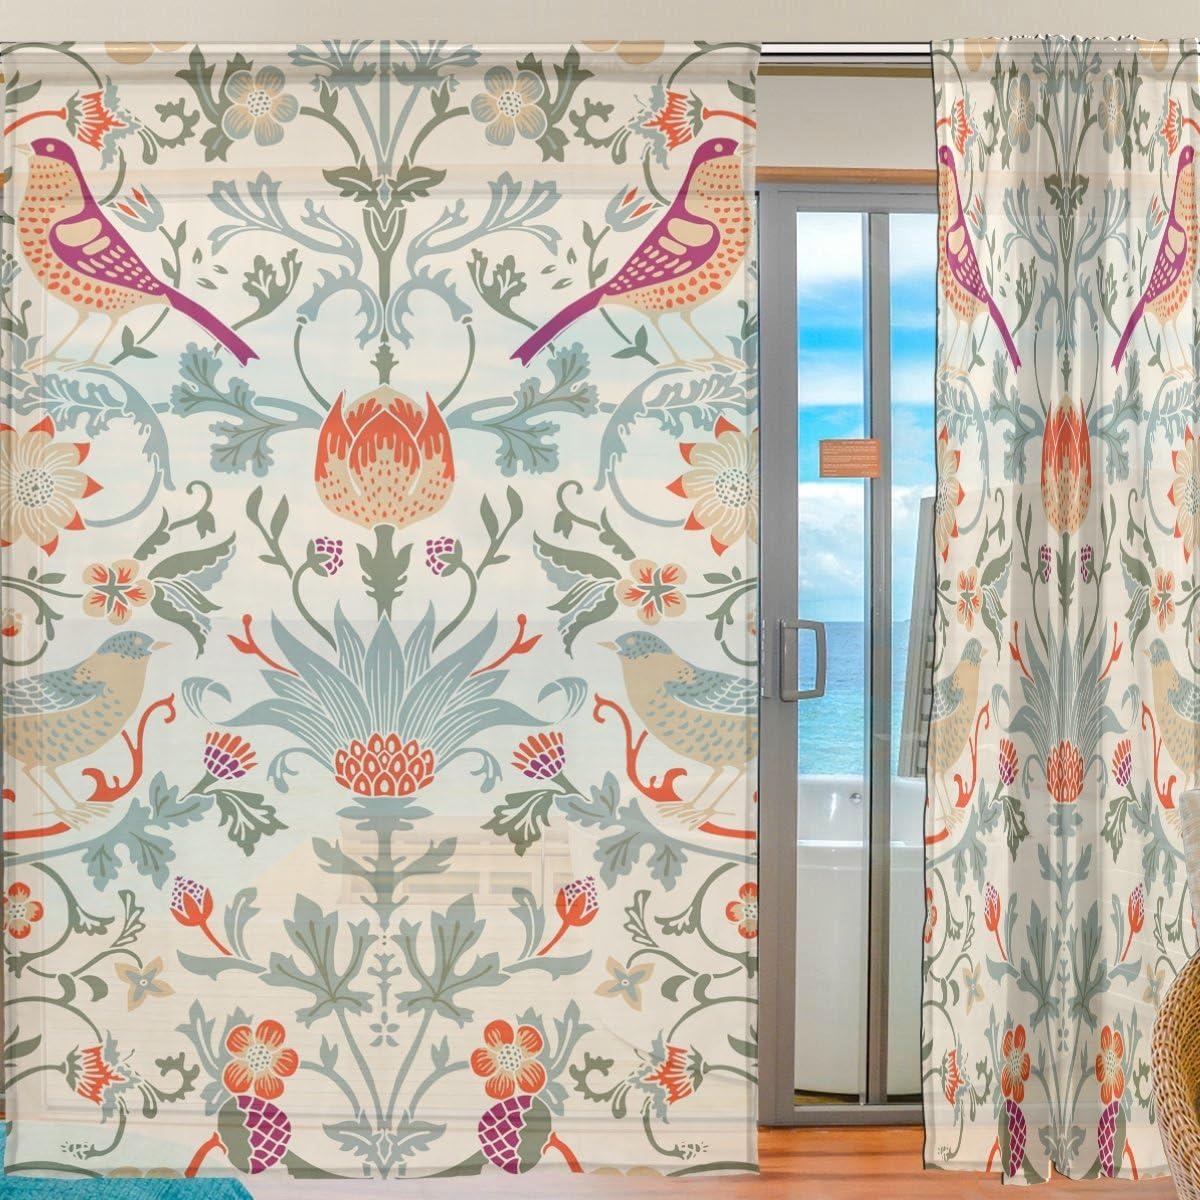 INGBAGS Bedroom Decor Living Room Decorations William Morris Flower Pattern Print Tulle Polyester Door Window Gauze Sheer Curtain Drape Two Panels Set 55×78 inch,Set of 2